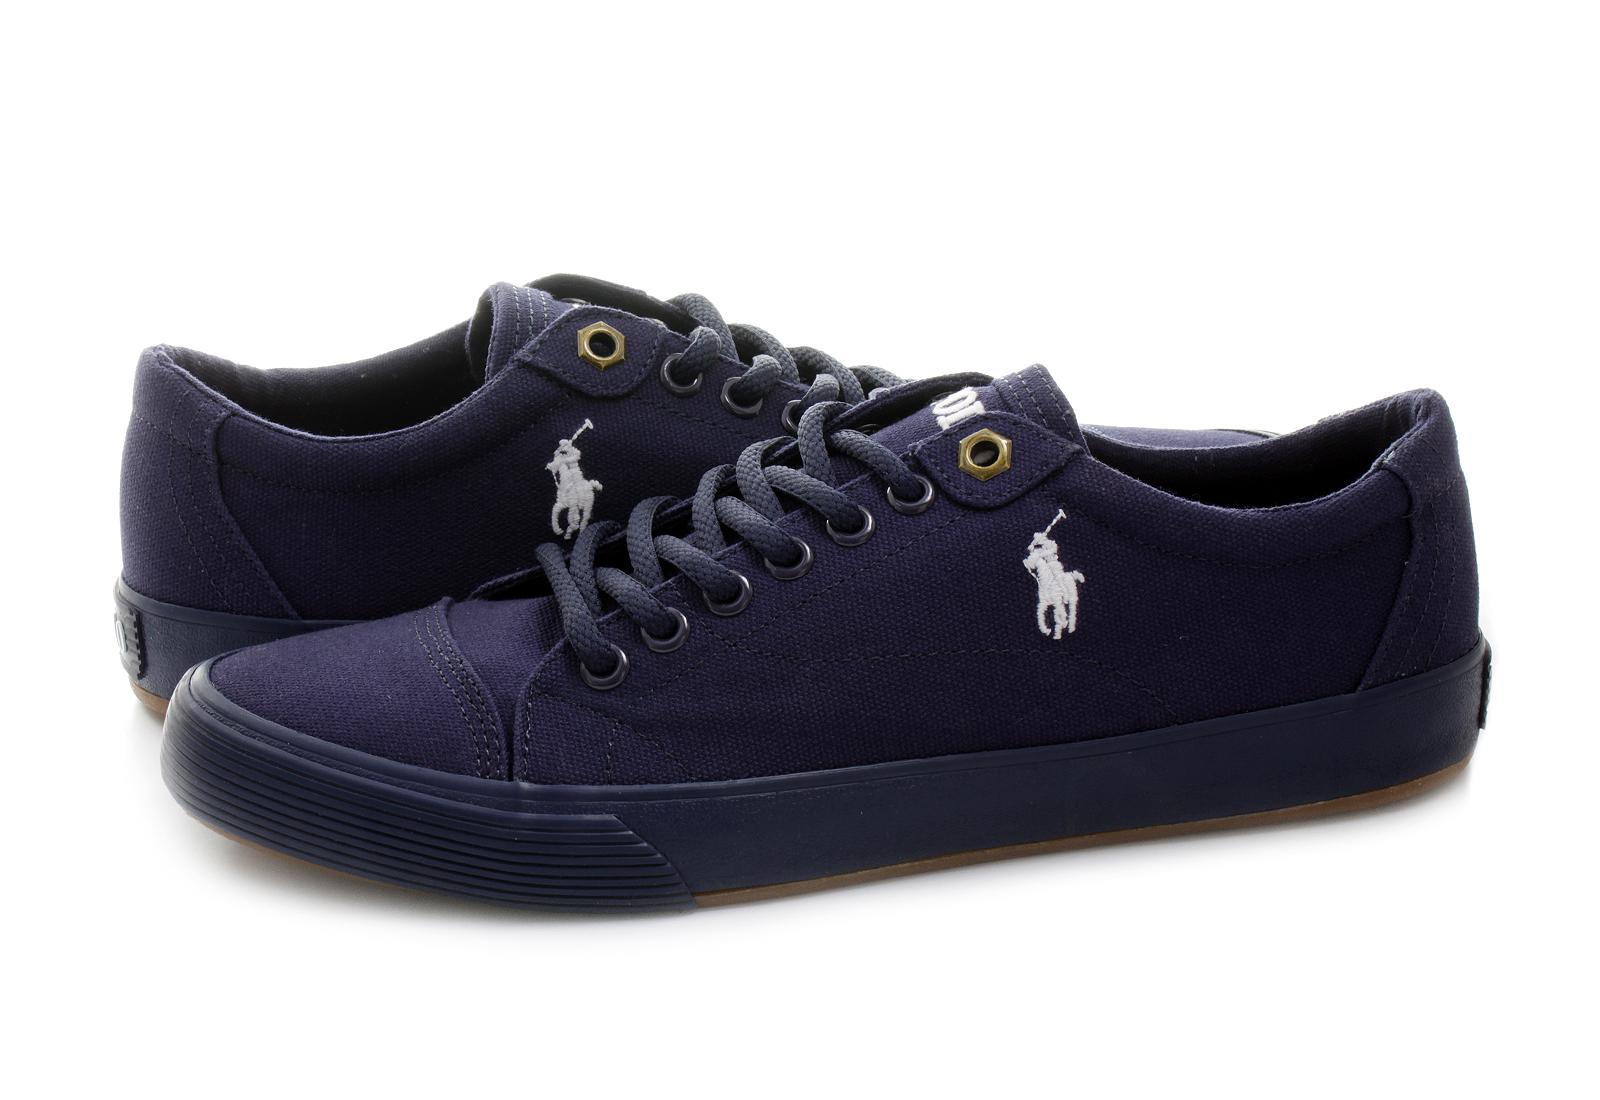 Polo Ralph Lauren Cipő - Klinger-ne - 816590855006 - Office Shoes ... 50deef109d